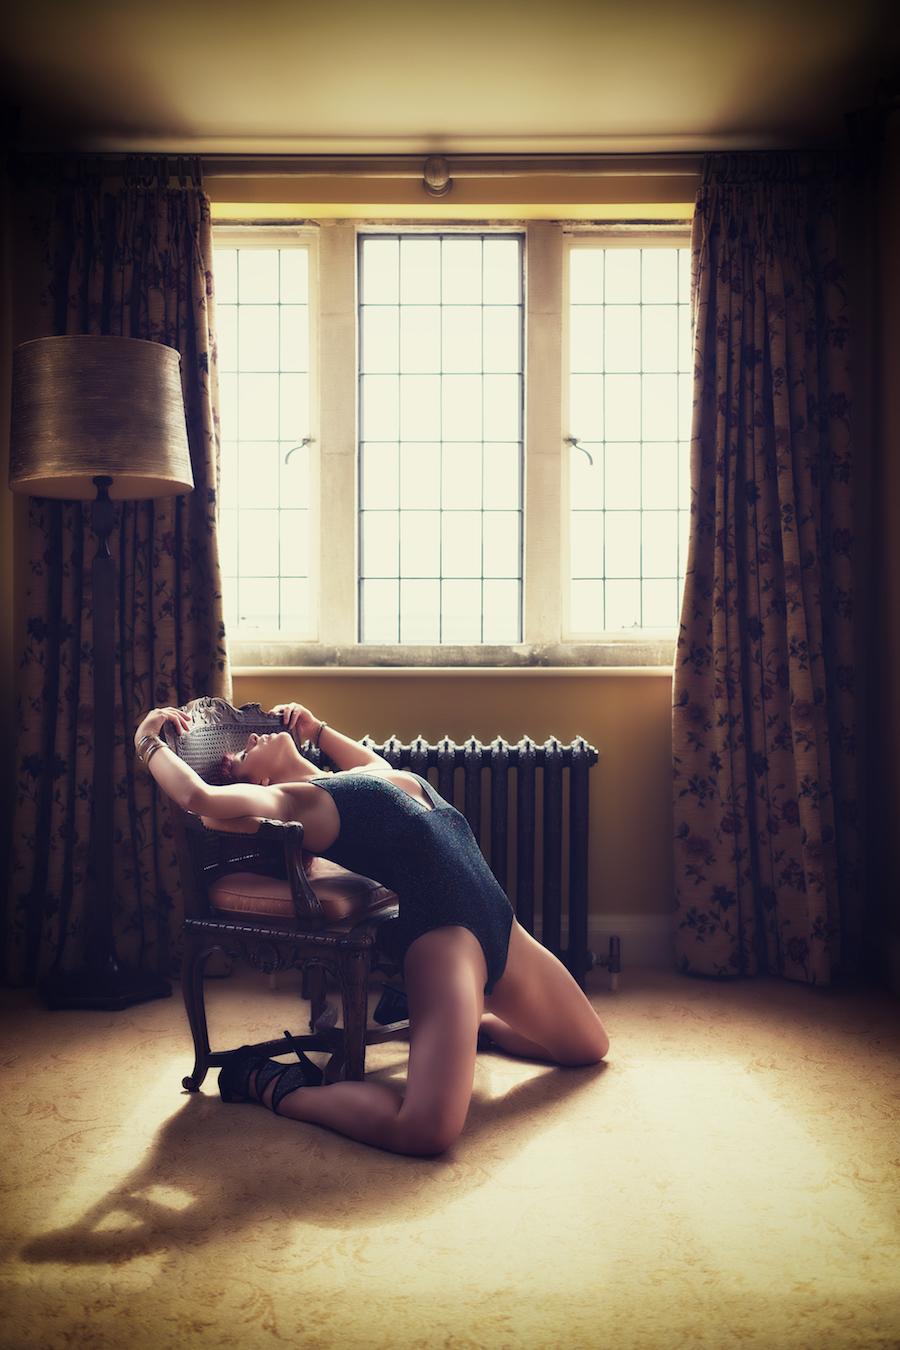 Let the rays wash over you / Model Freya, Stylist Freya / Uploaded 4th May 2016 @ 06:04 PM